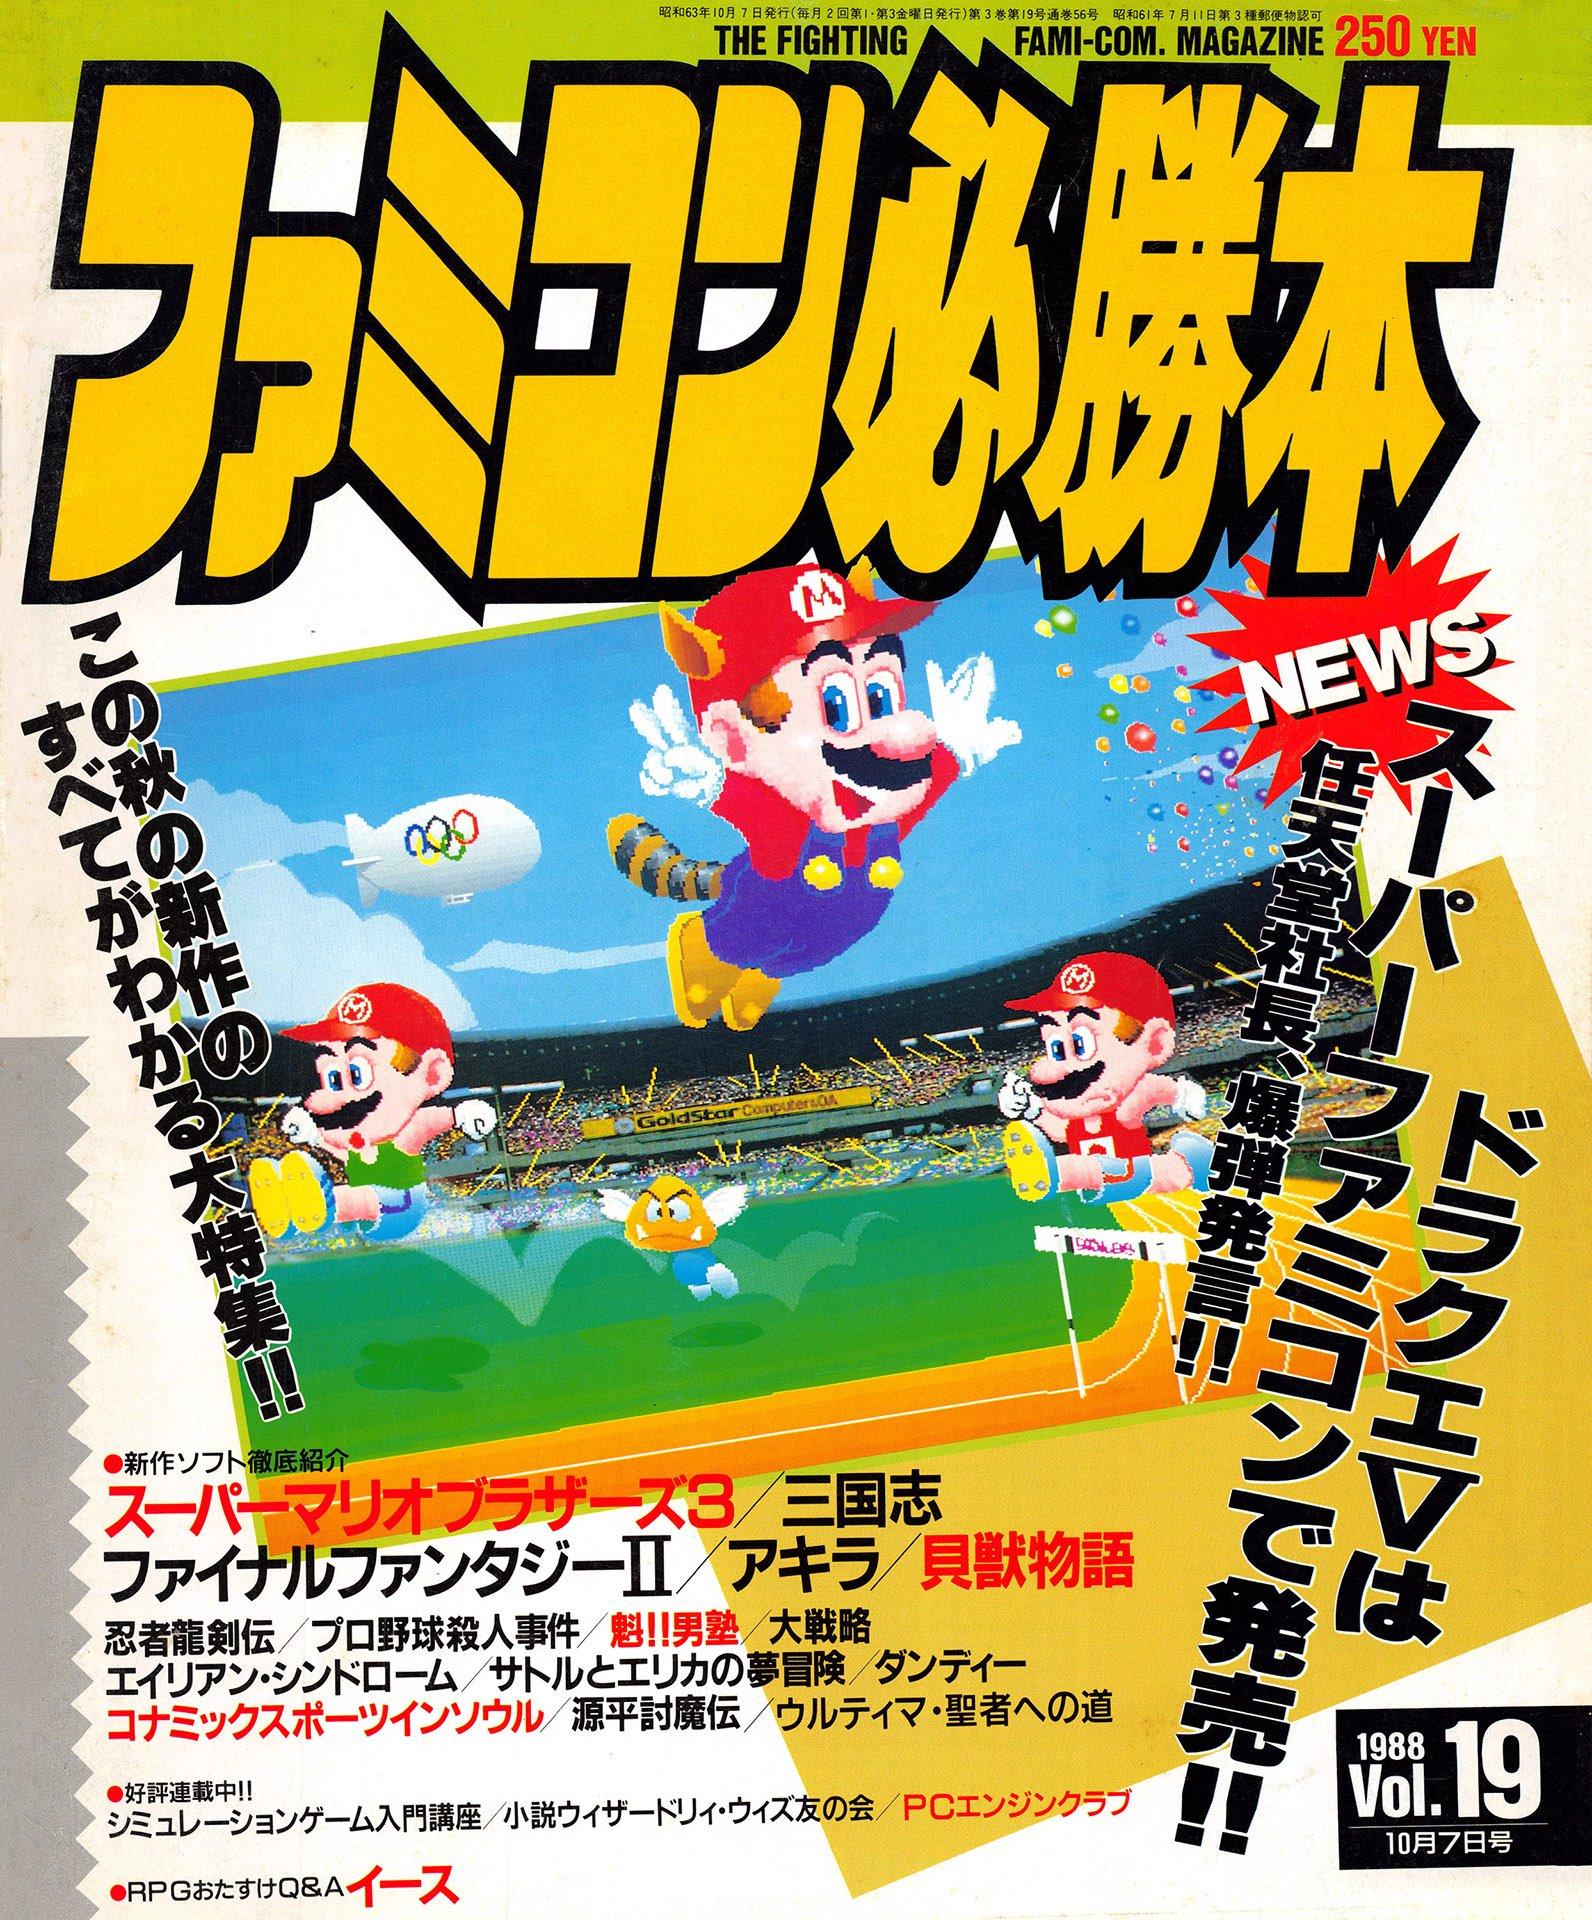 New Release - Famicom Hisshoubon Issue 056 (October 7, 1988)